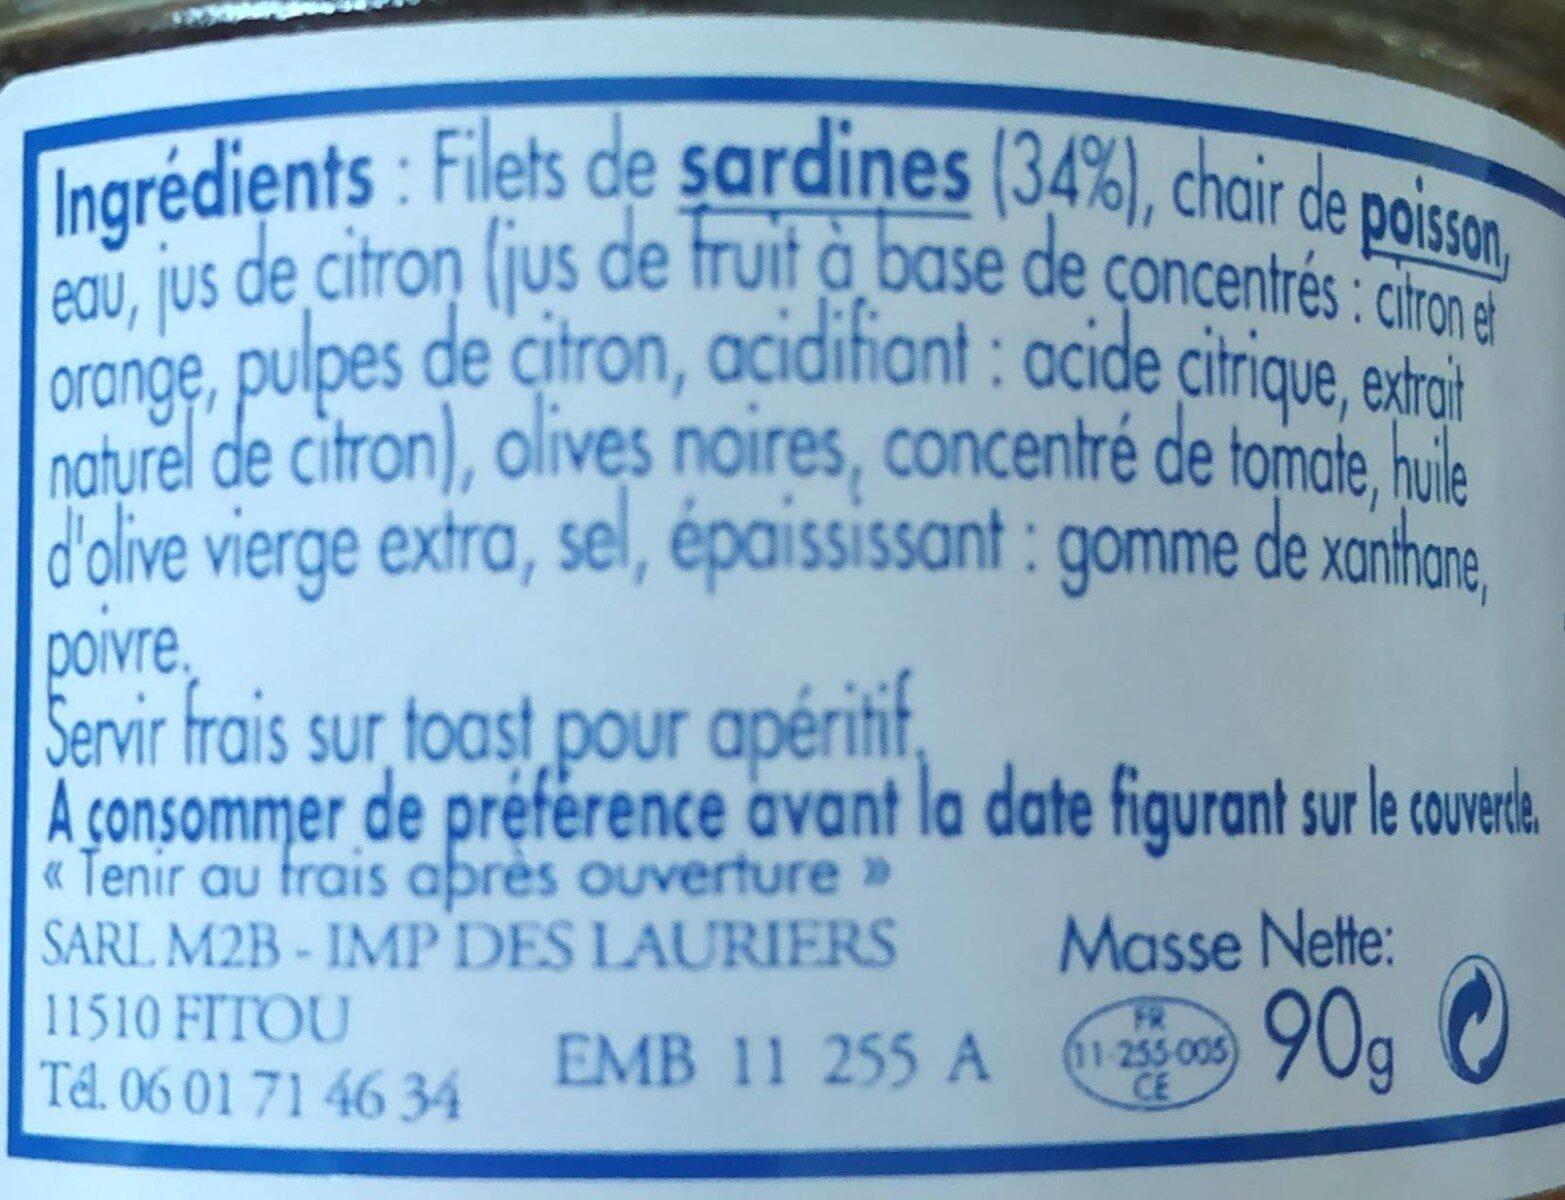 Sardinade - Ingredients